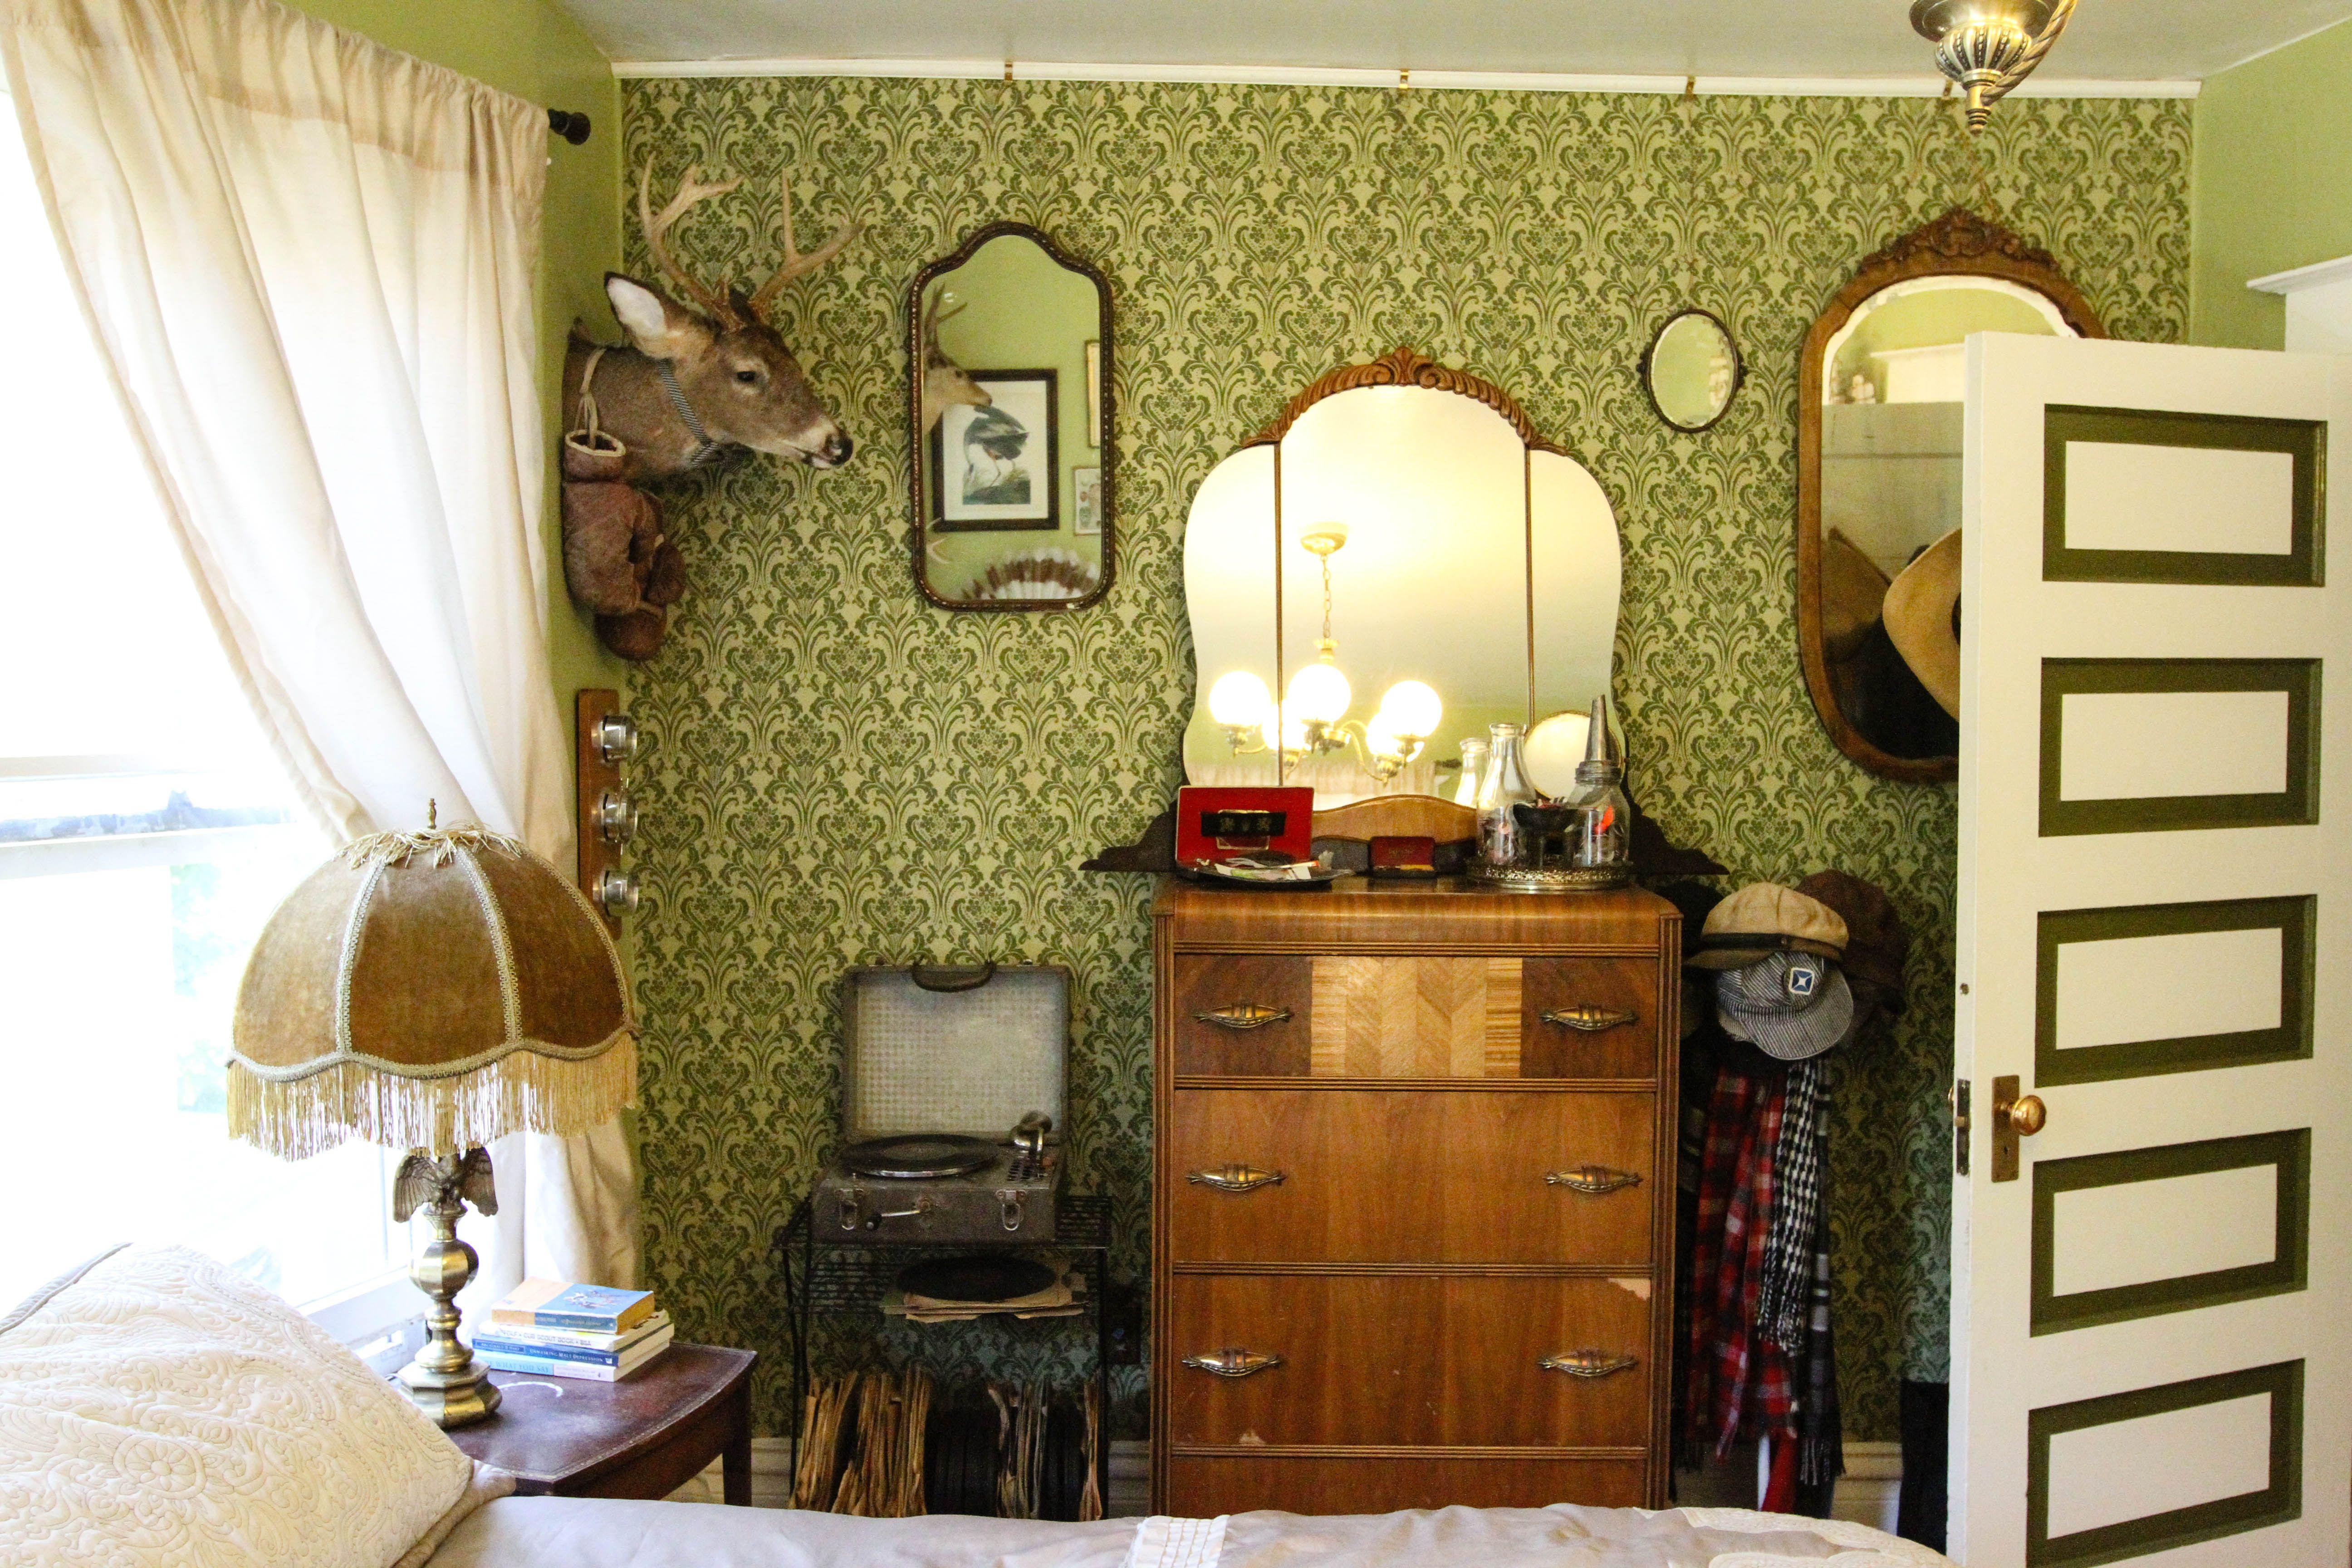 Joe's Victorian 'Owl House' Home, Vintage apartment